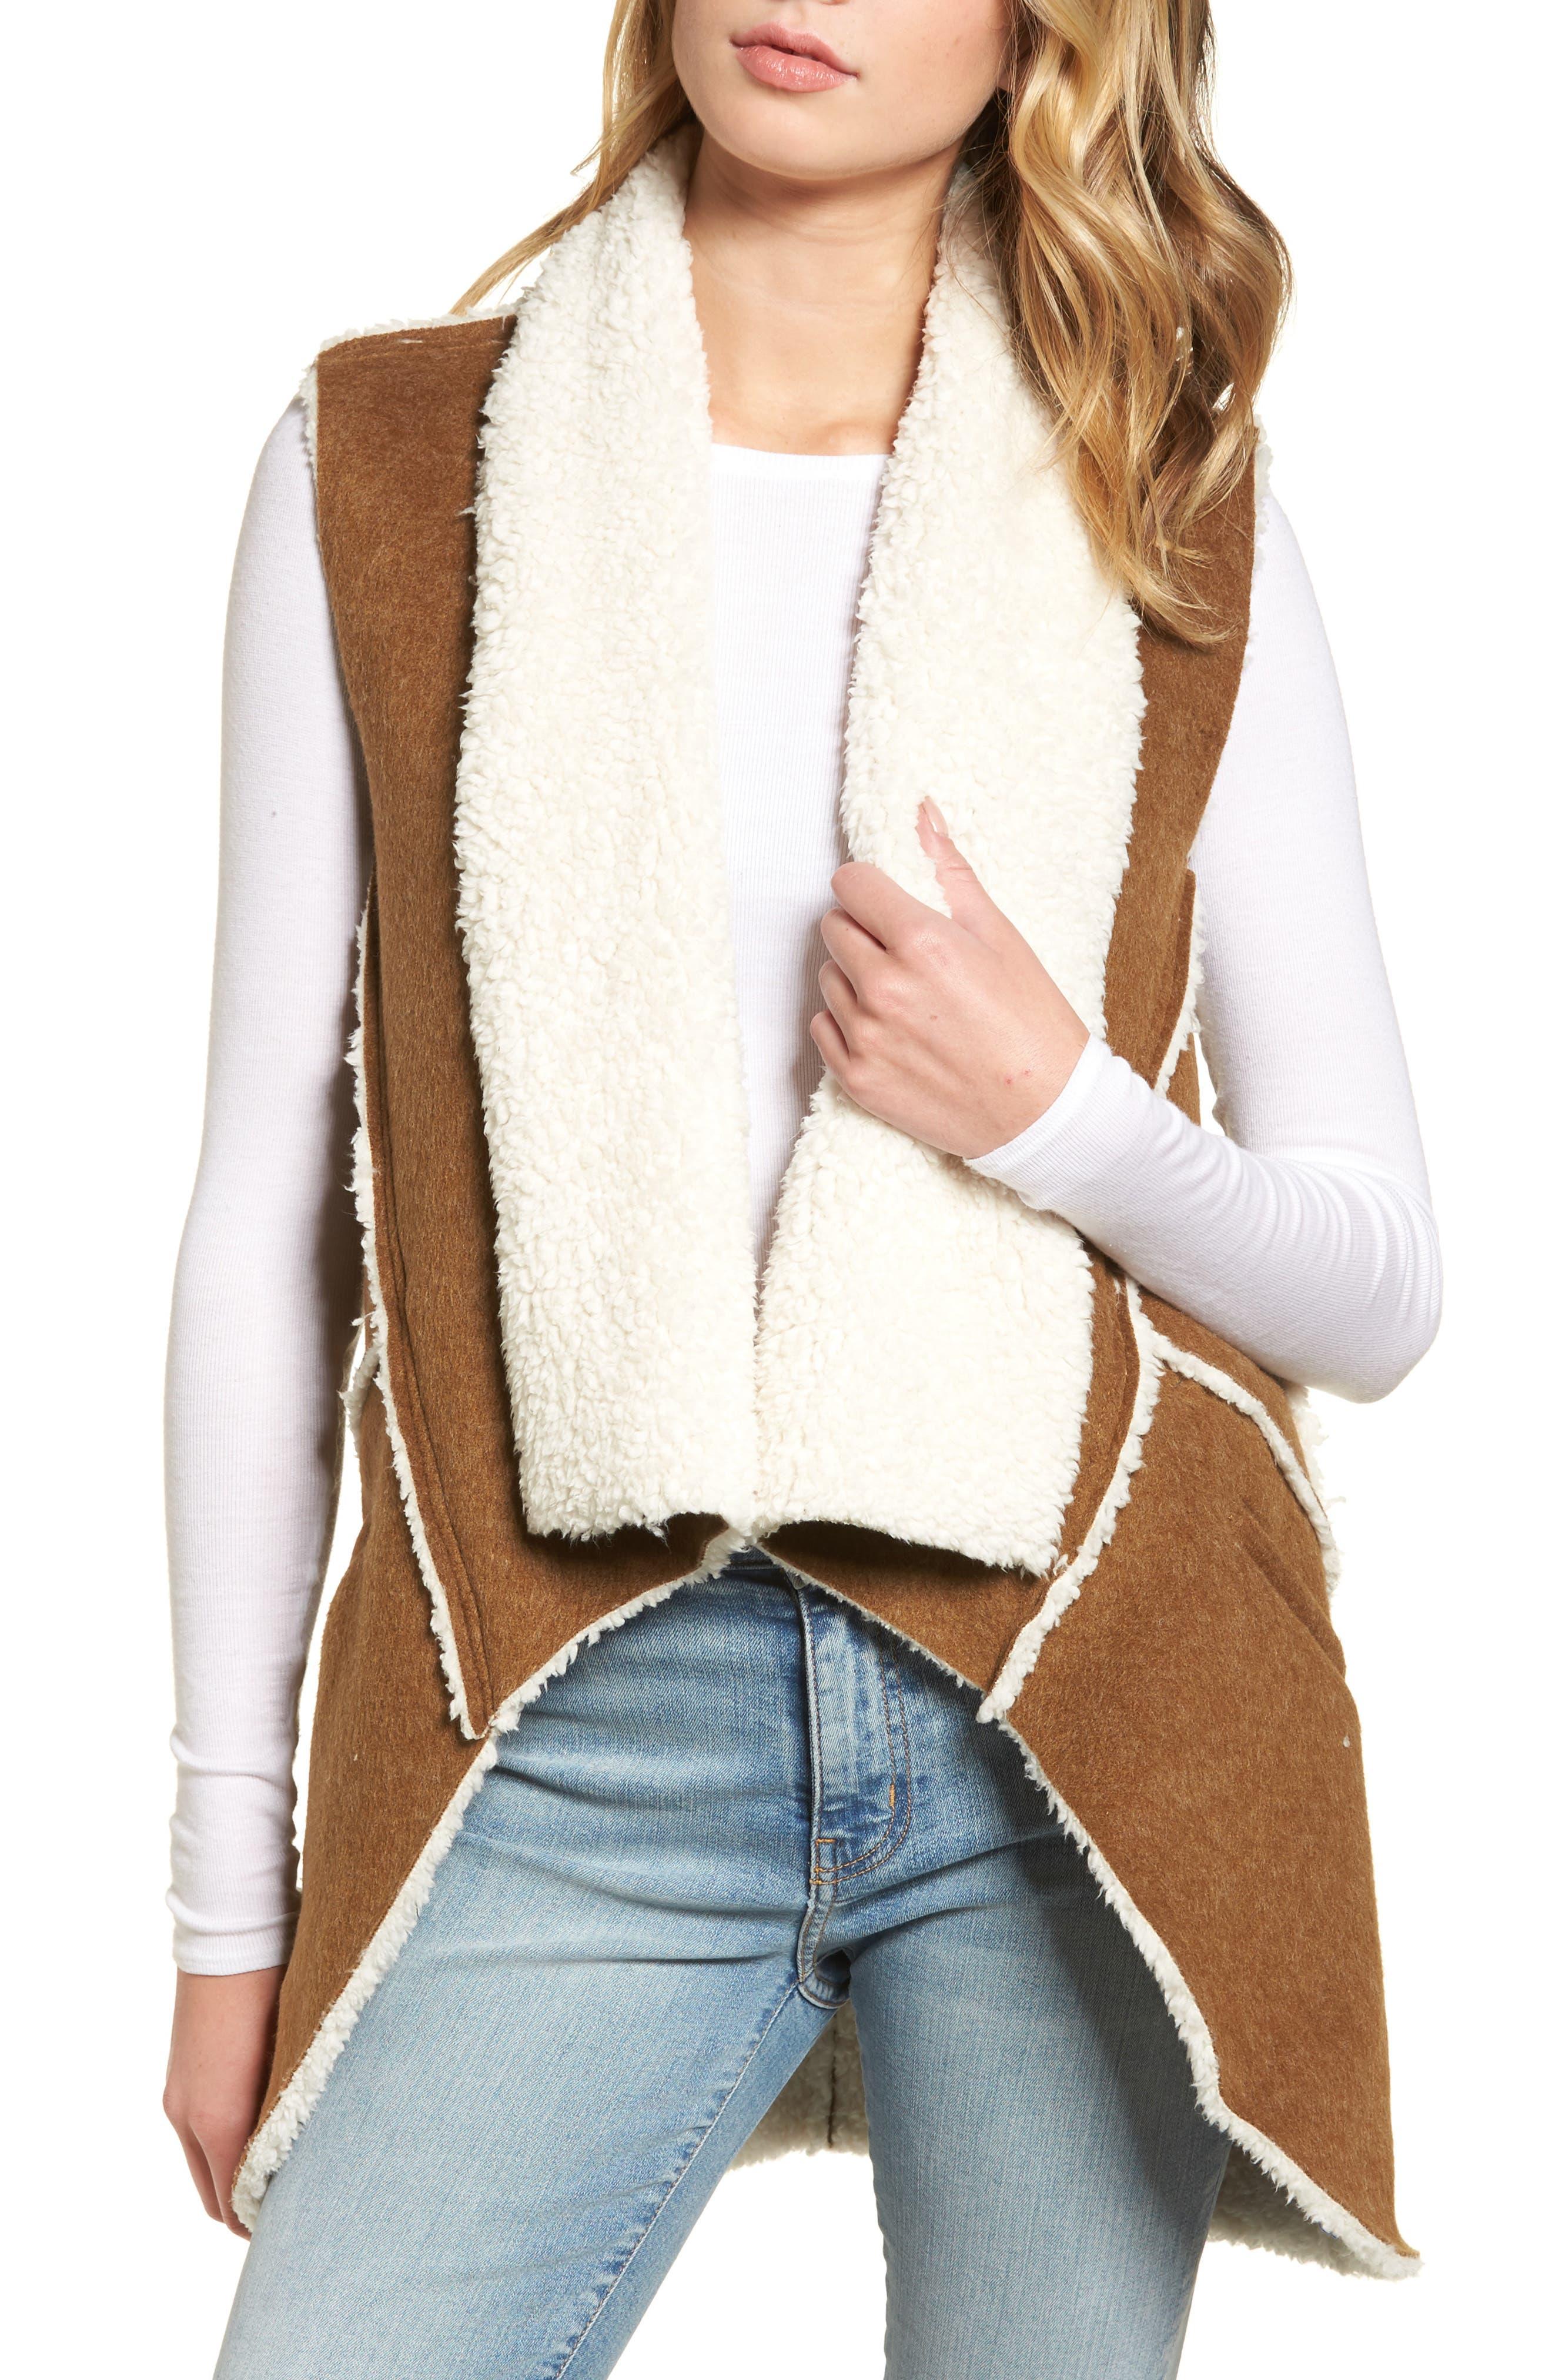 Alternate Image 1 Selected - Dylan Flannel Faux Shearling Vest